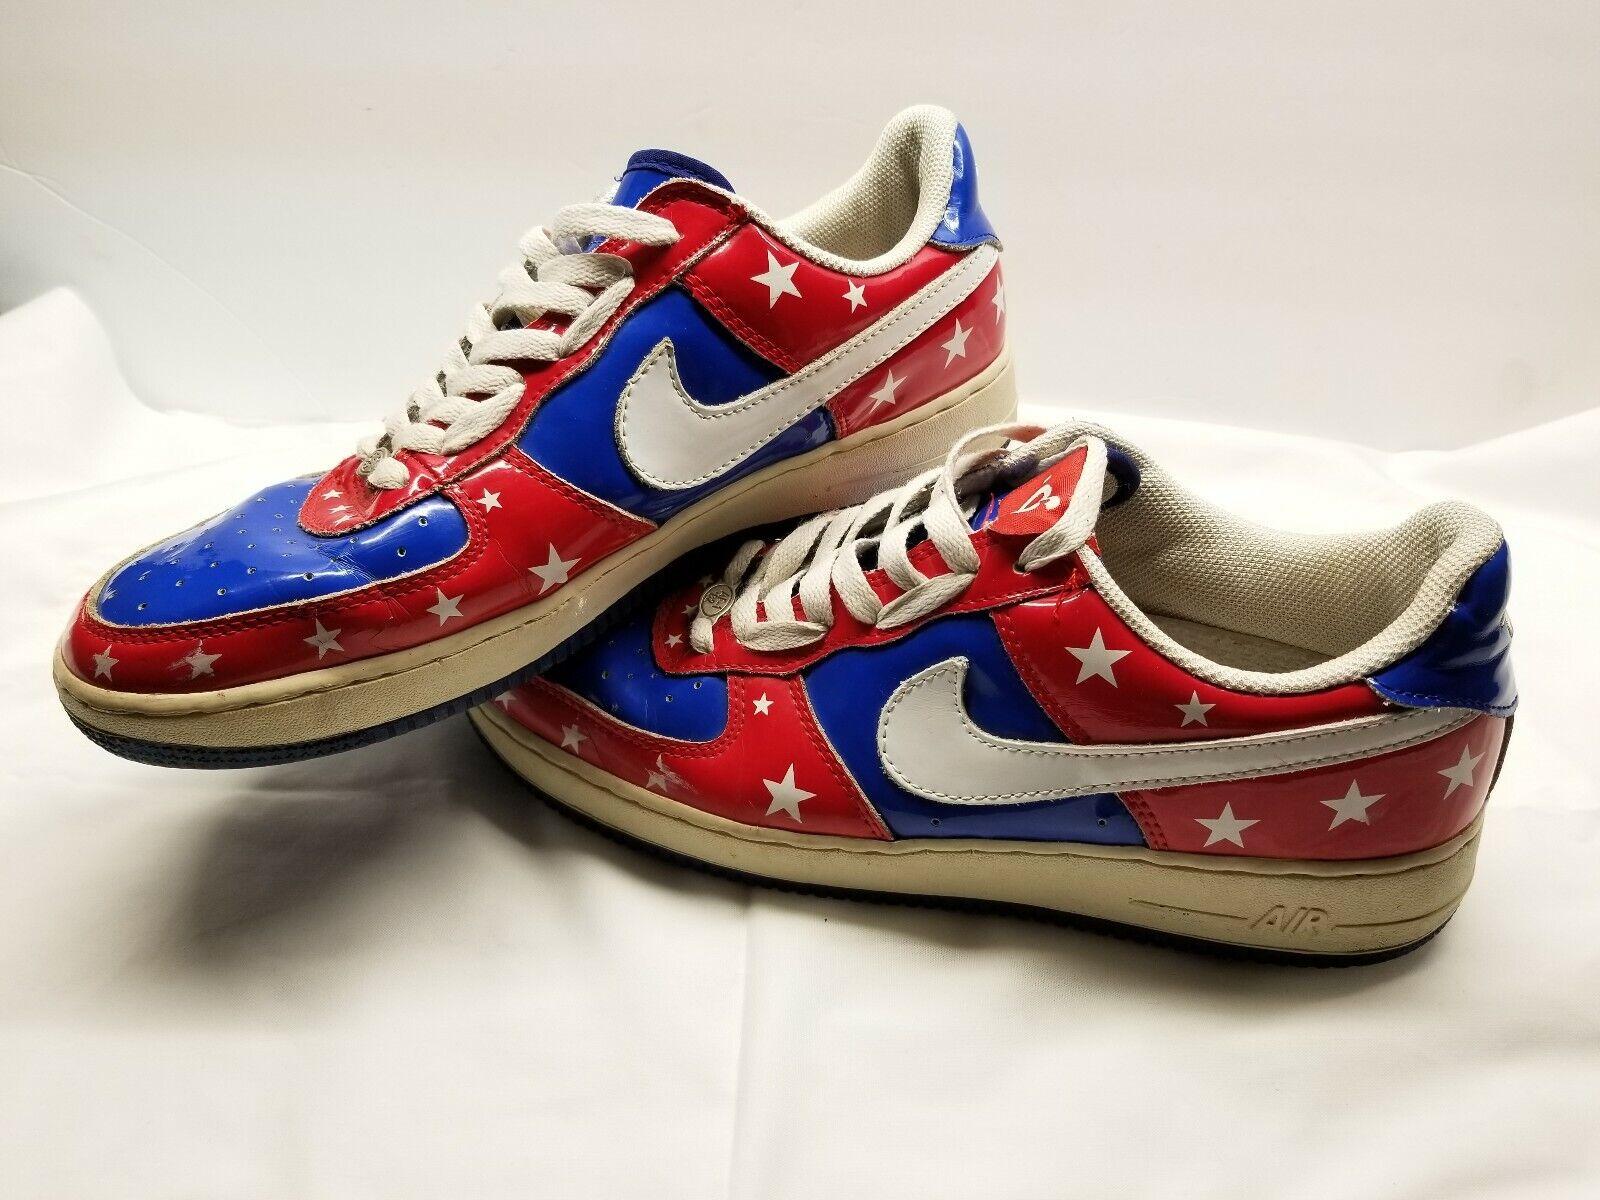 Raro'06 para Hombre Nike Force 1 82 todas las estrellas Air tenis zapatos talla 13